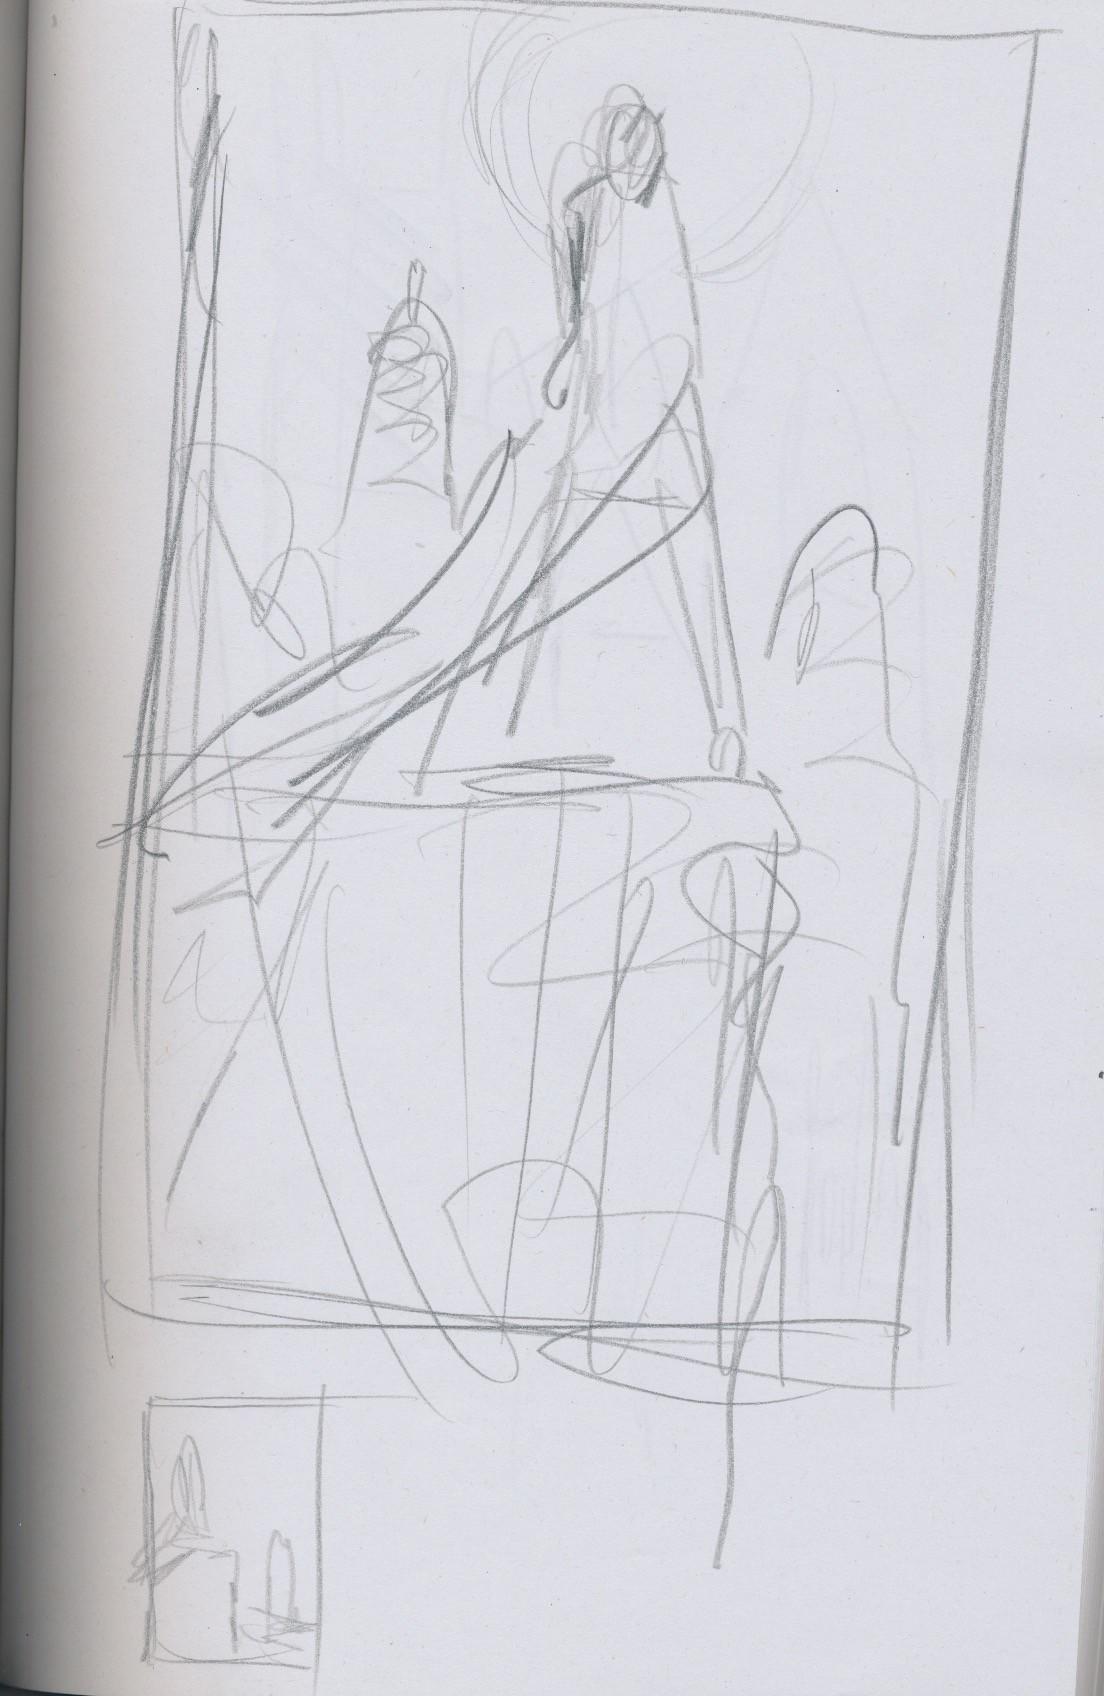 Yannick corboz scan 1